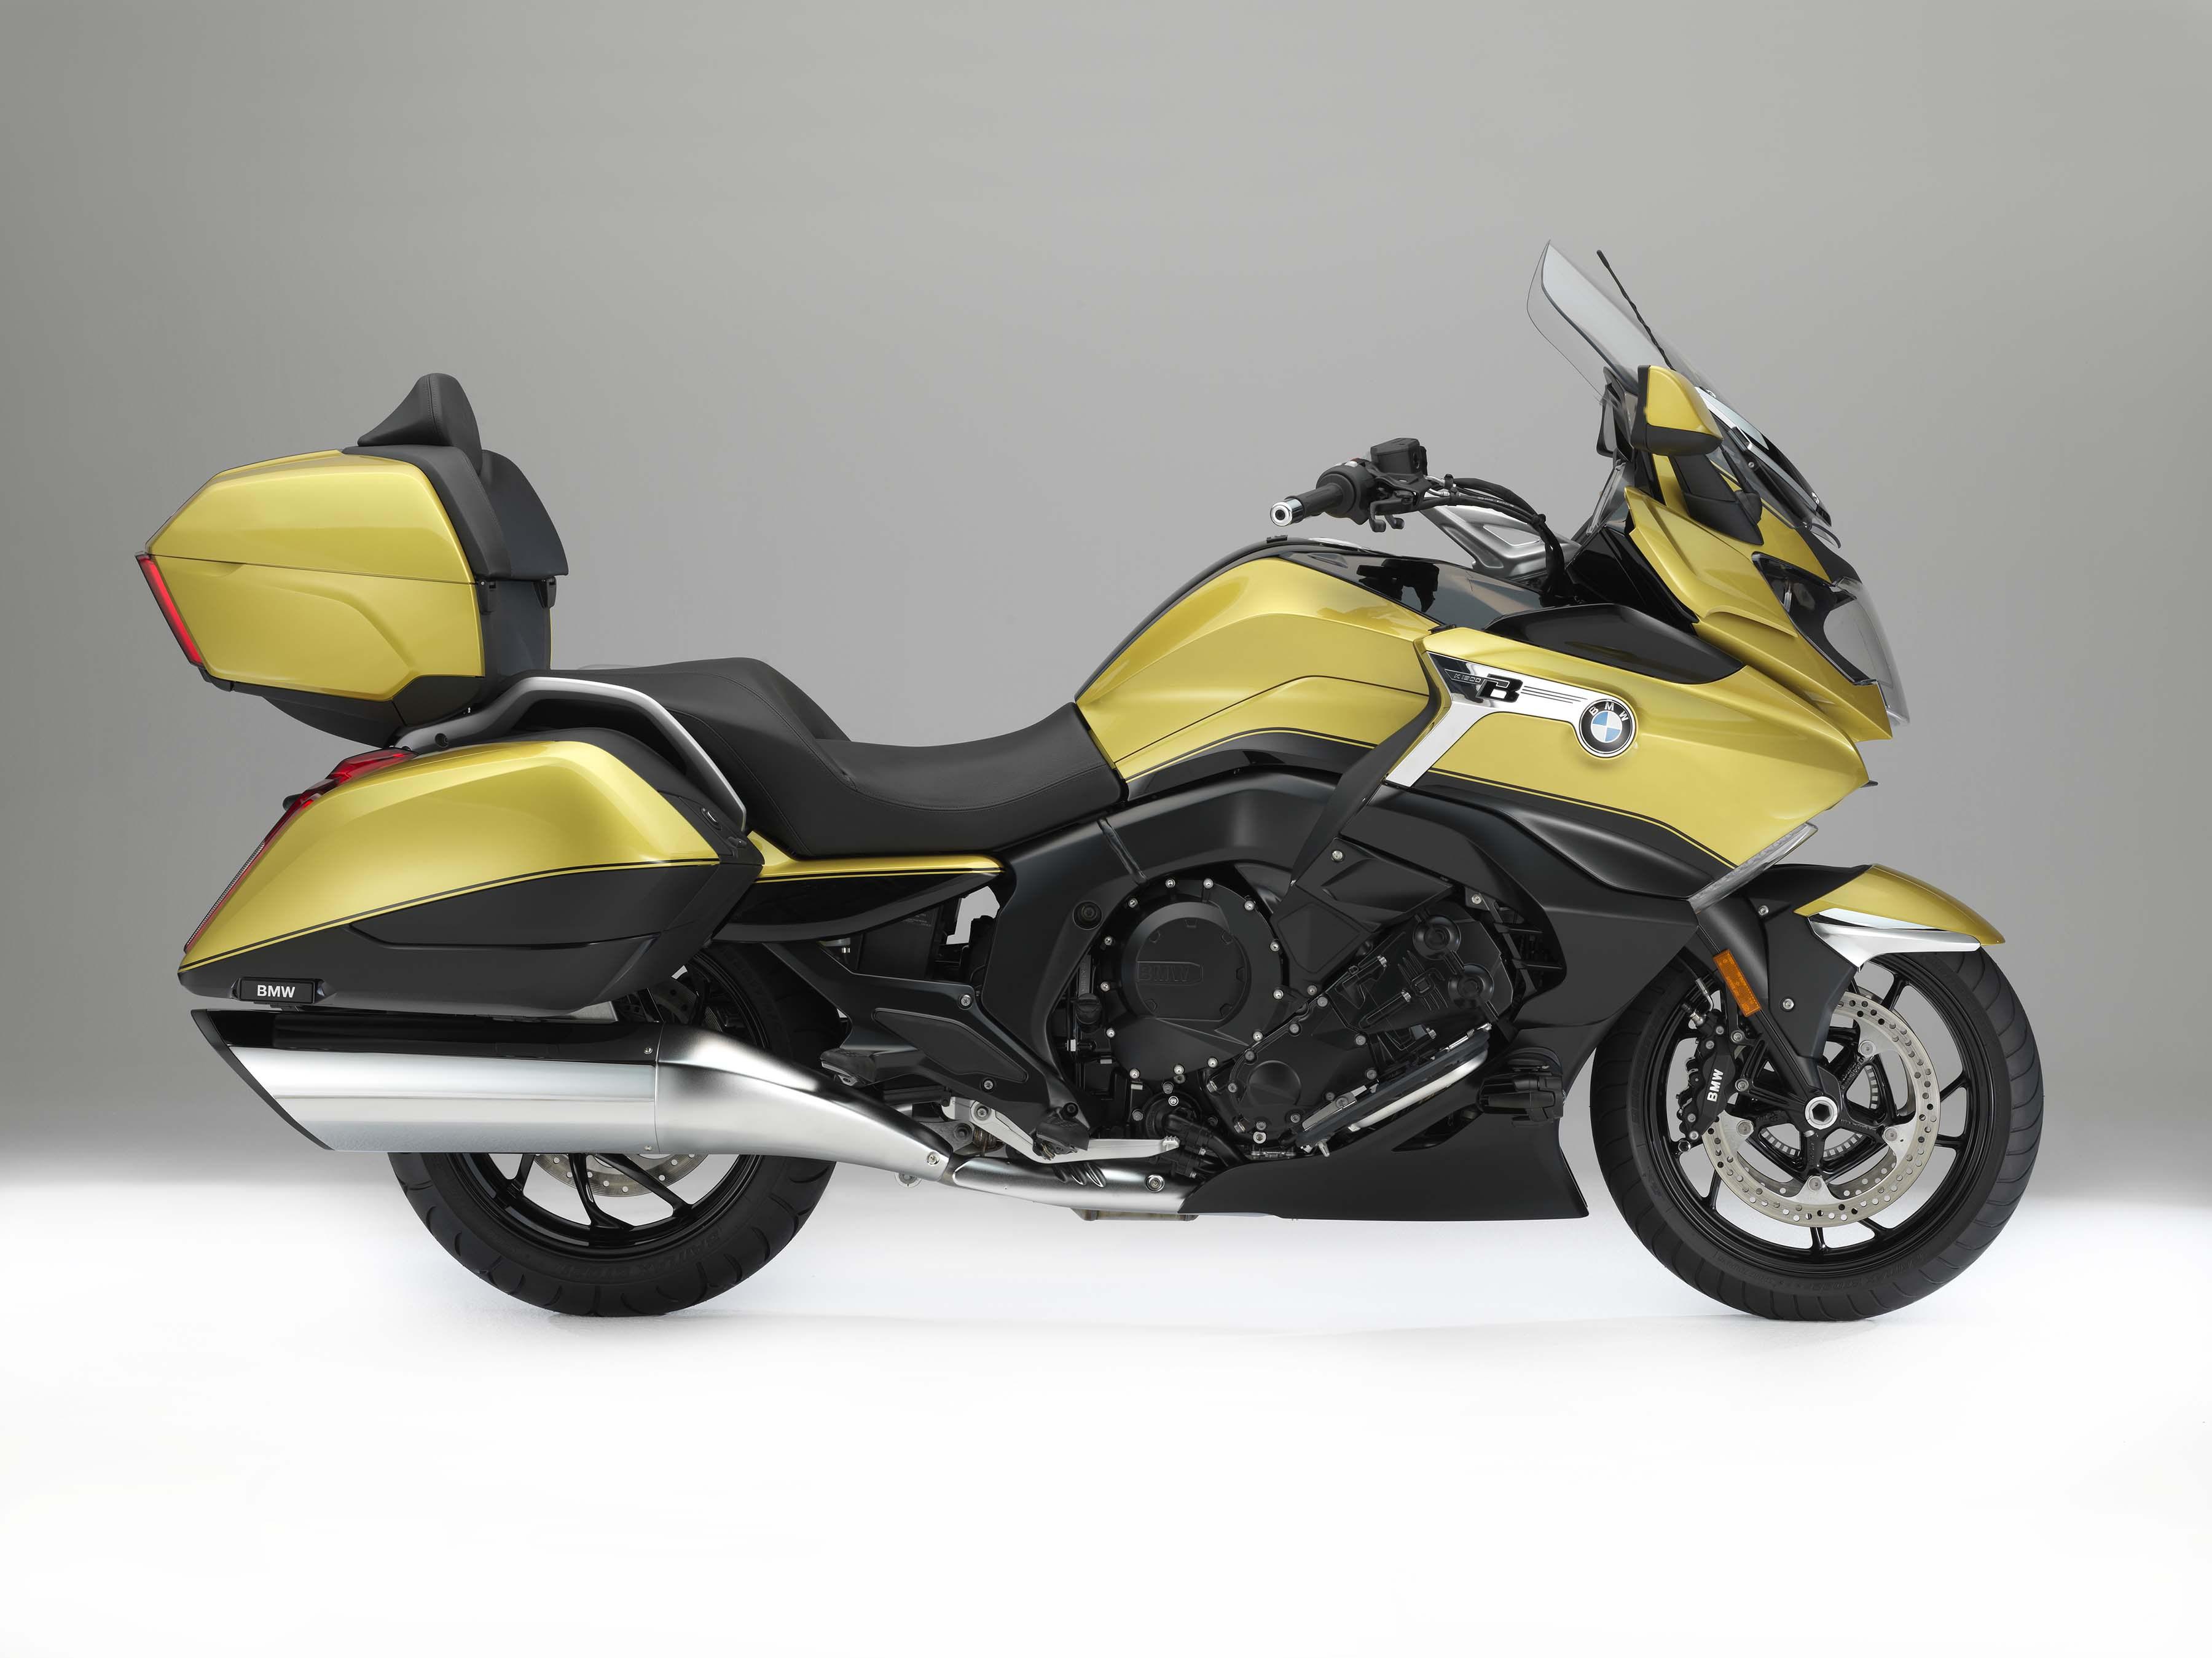 Bmw K1600 Grand America Motornl